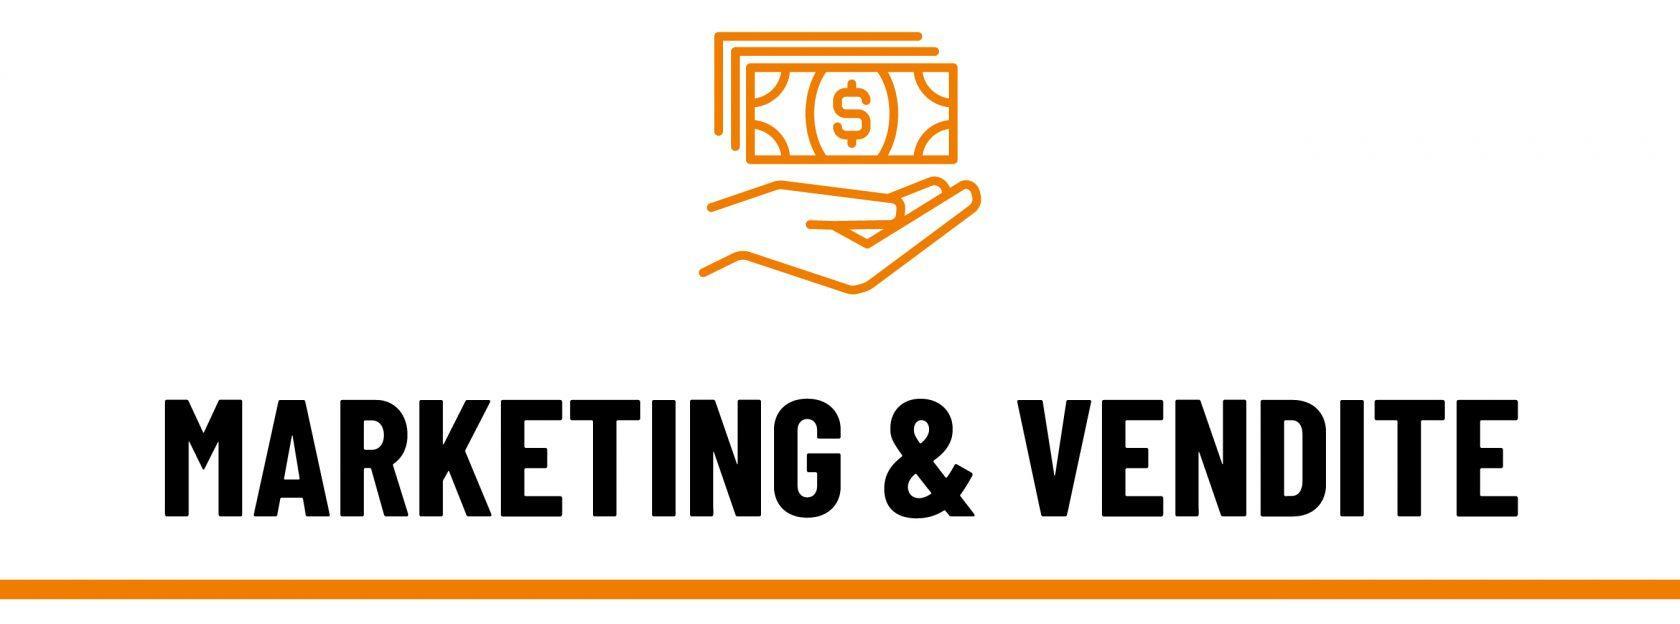 Header_Marketing&Vendite_OUT